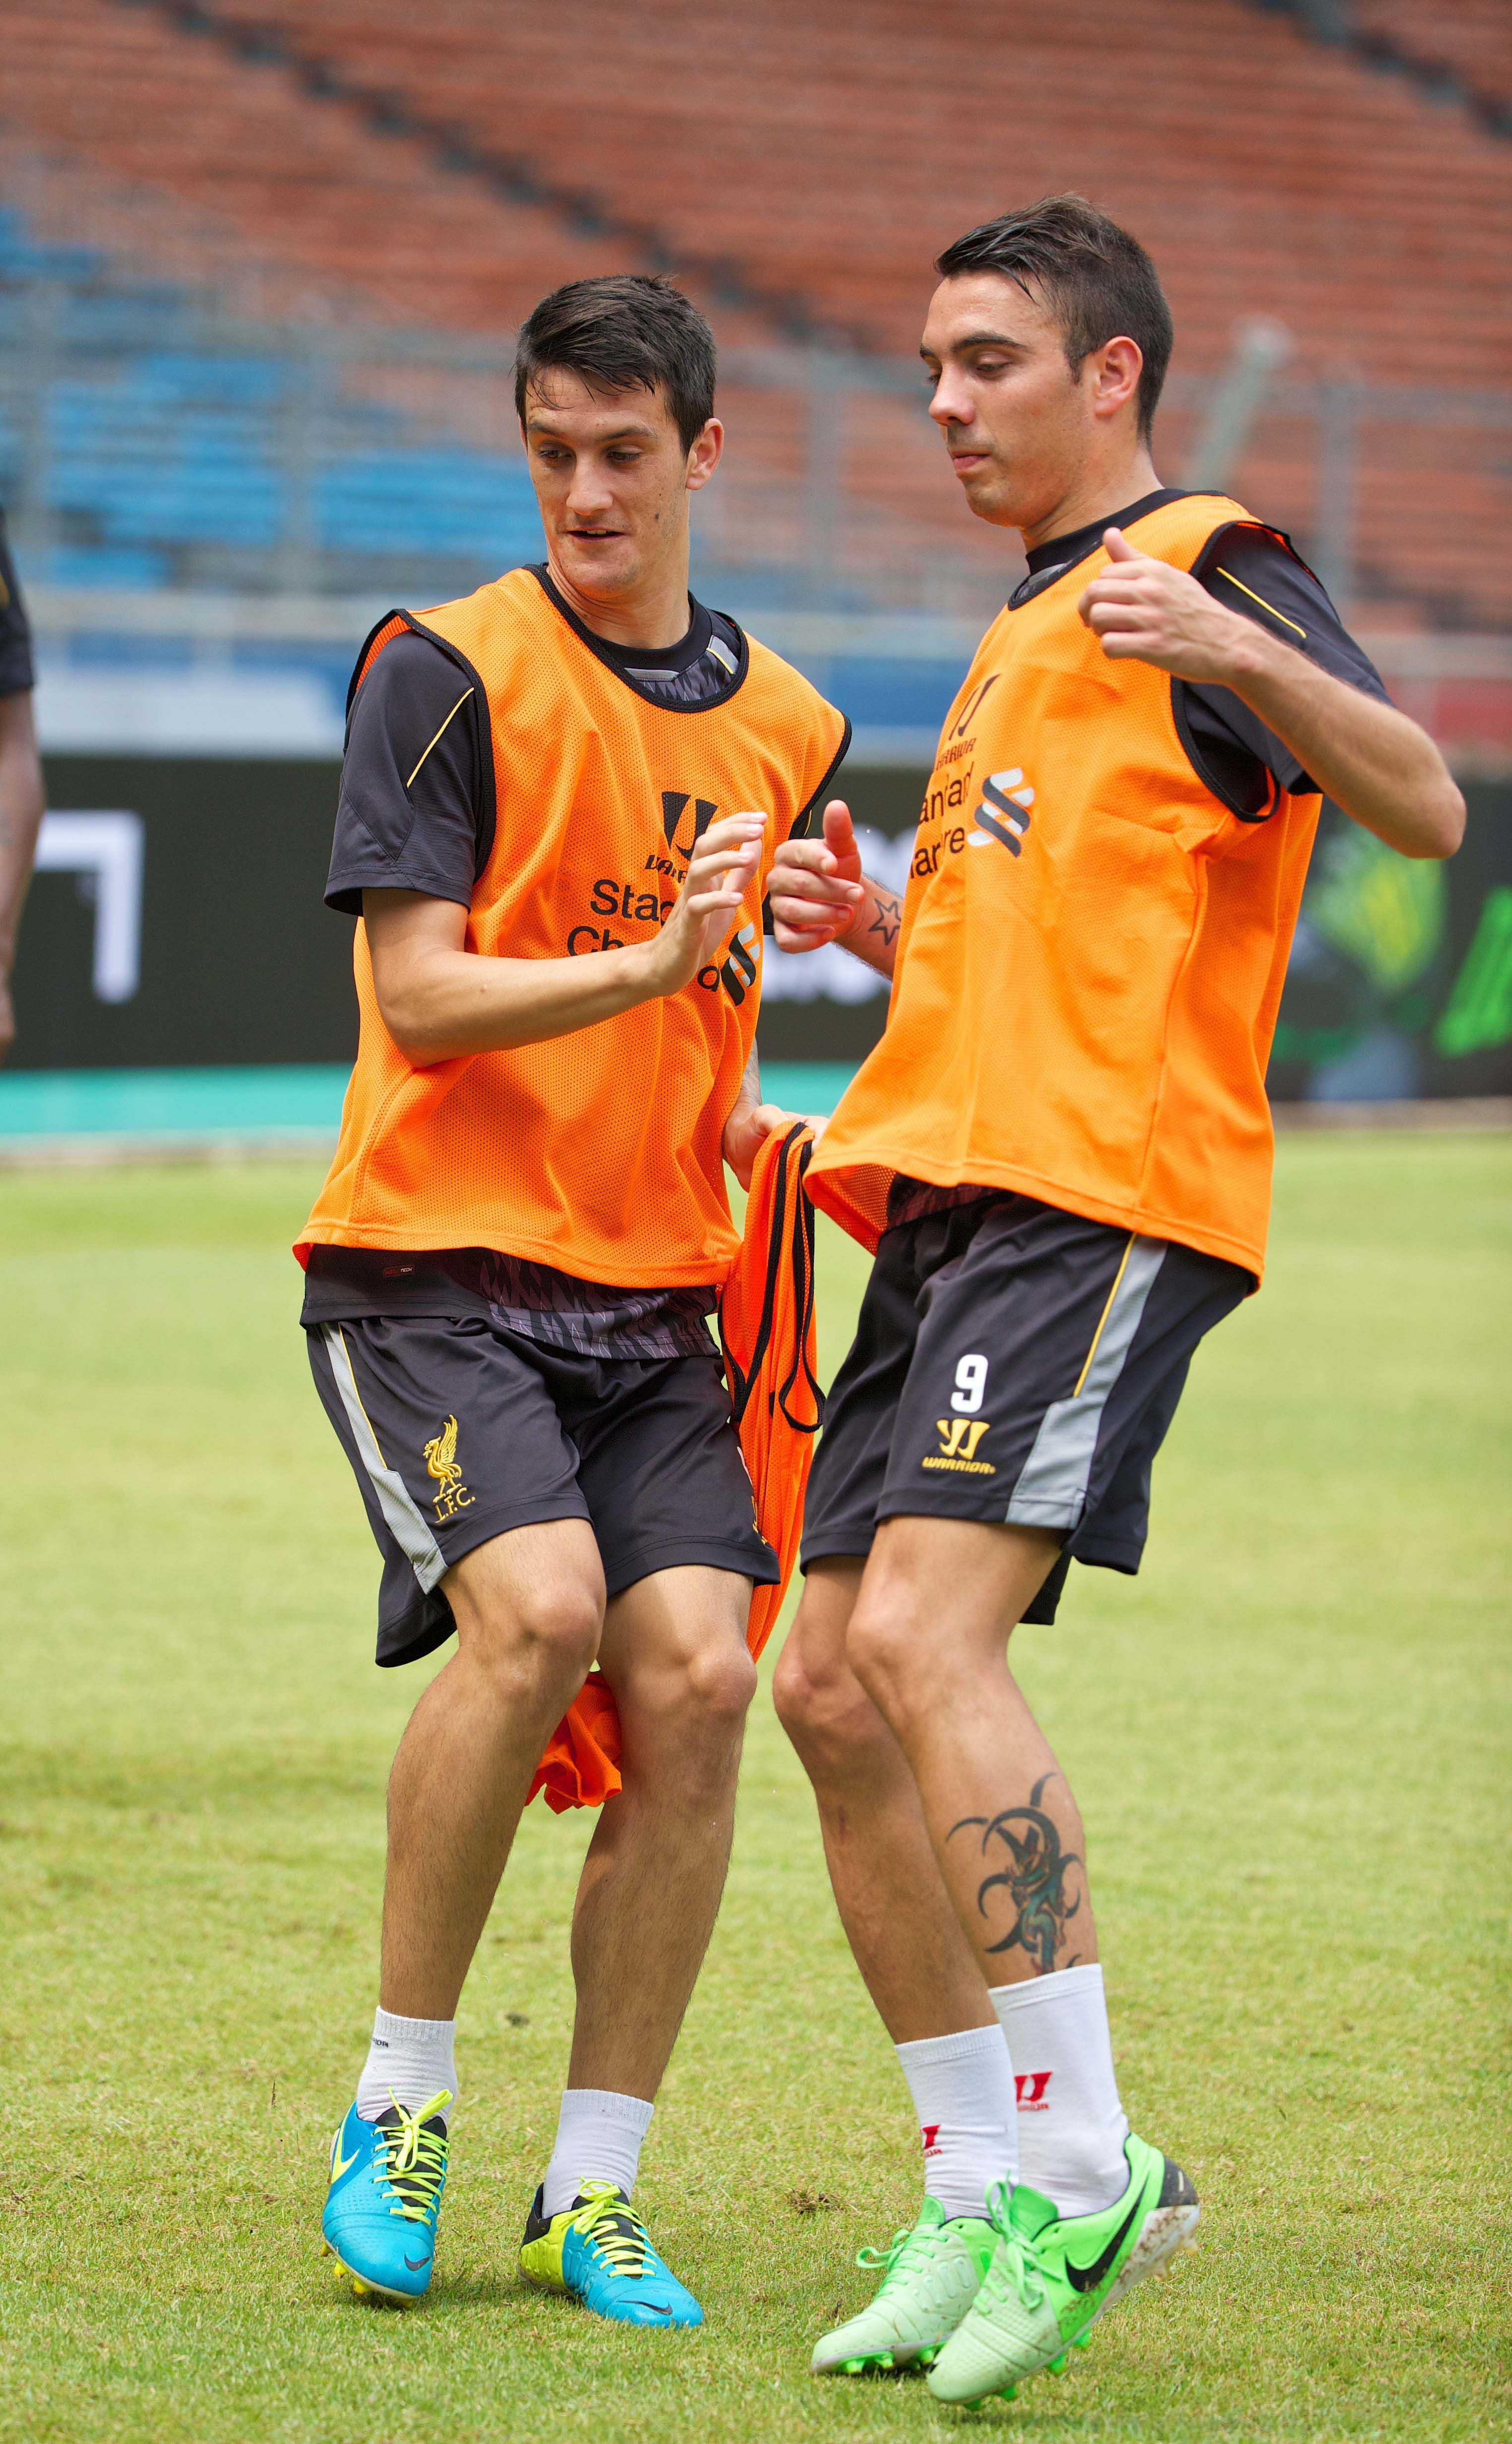 Football - Liverpool FC Preseason Tour 2013 - Indonesia